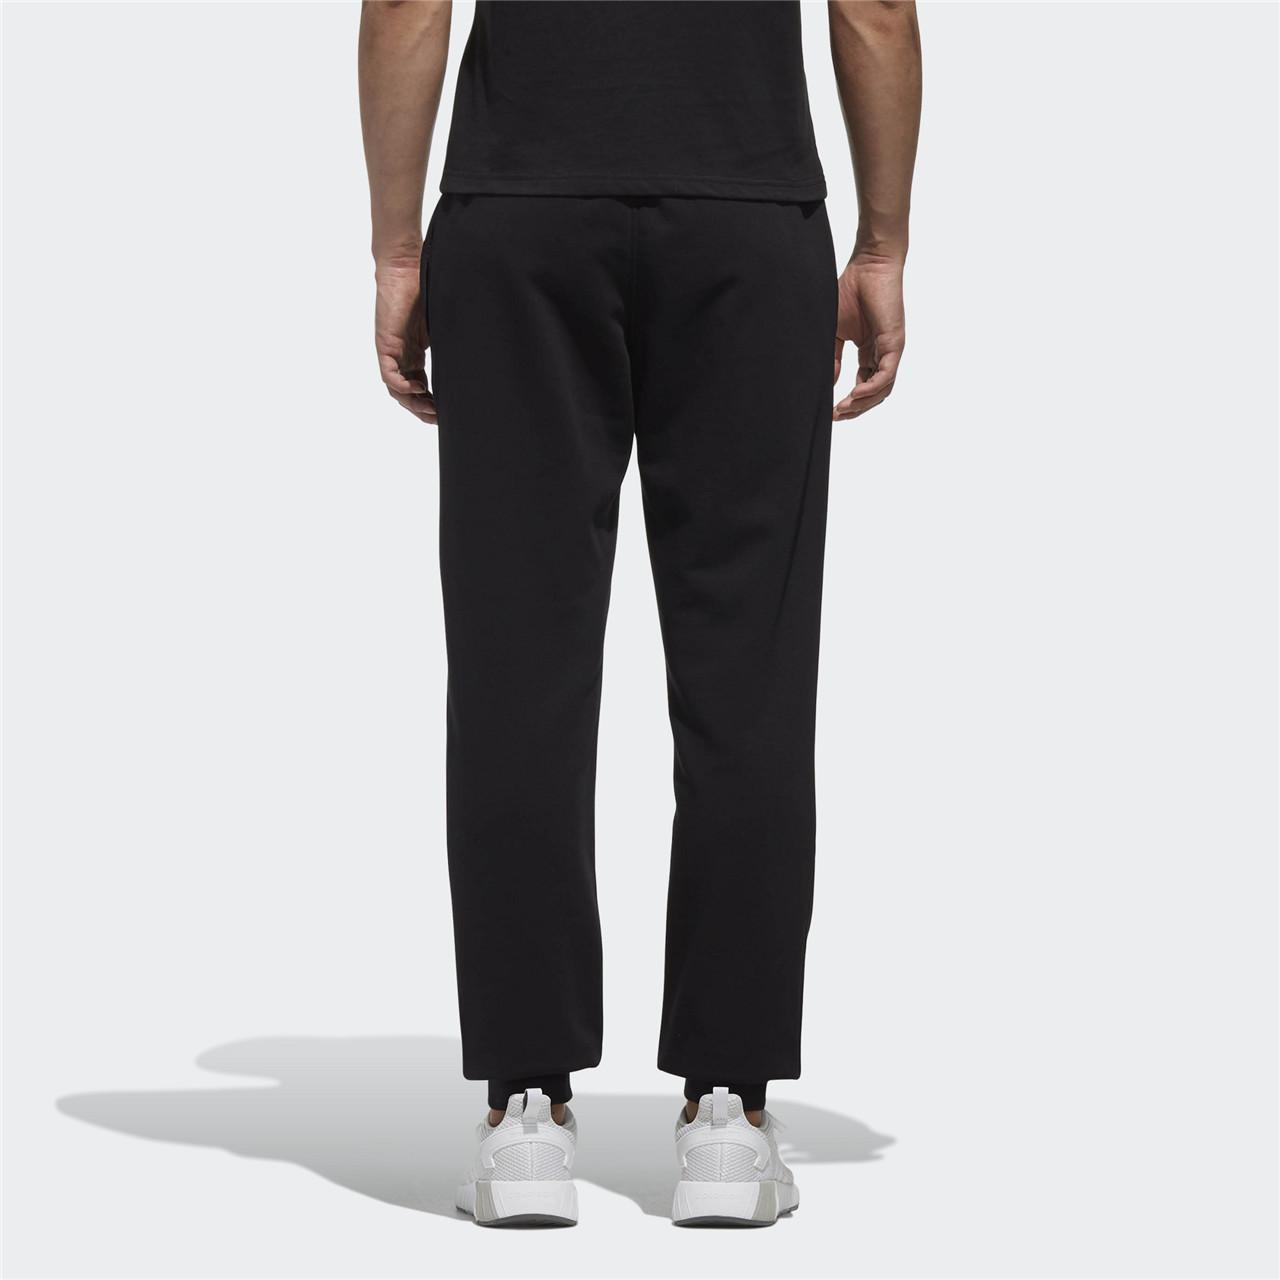 Adidas阿迪休闲男子长裤抽绳小腿字母logo针织运动束脚长裤DM4277